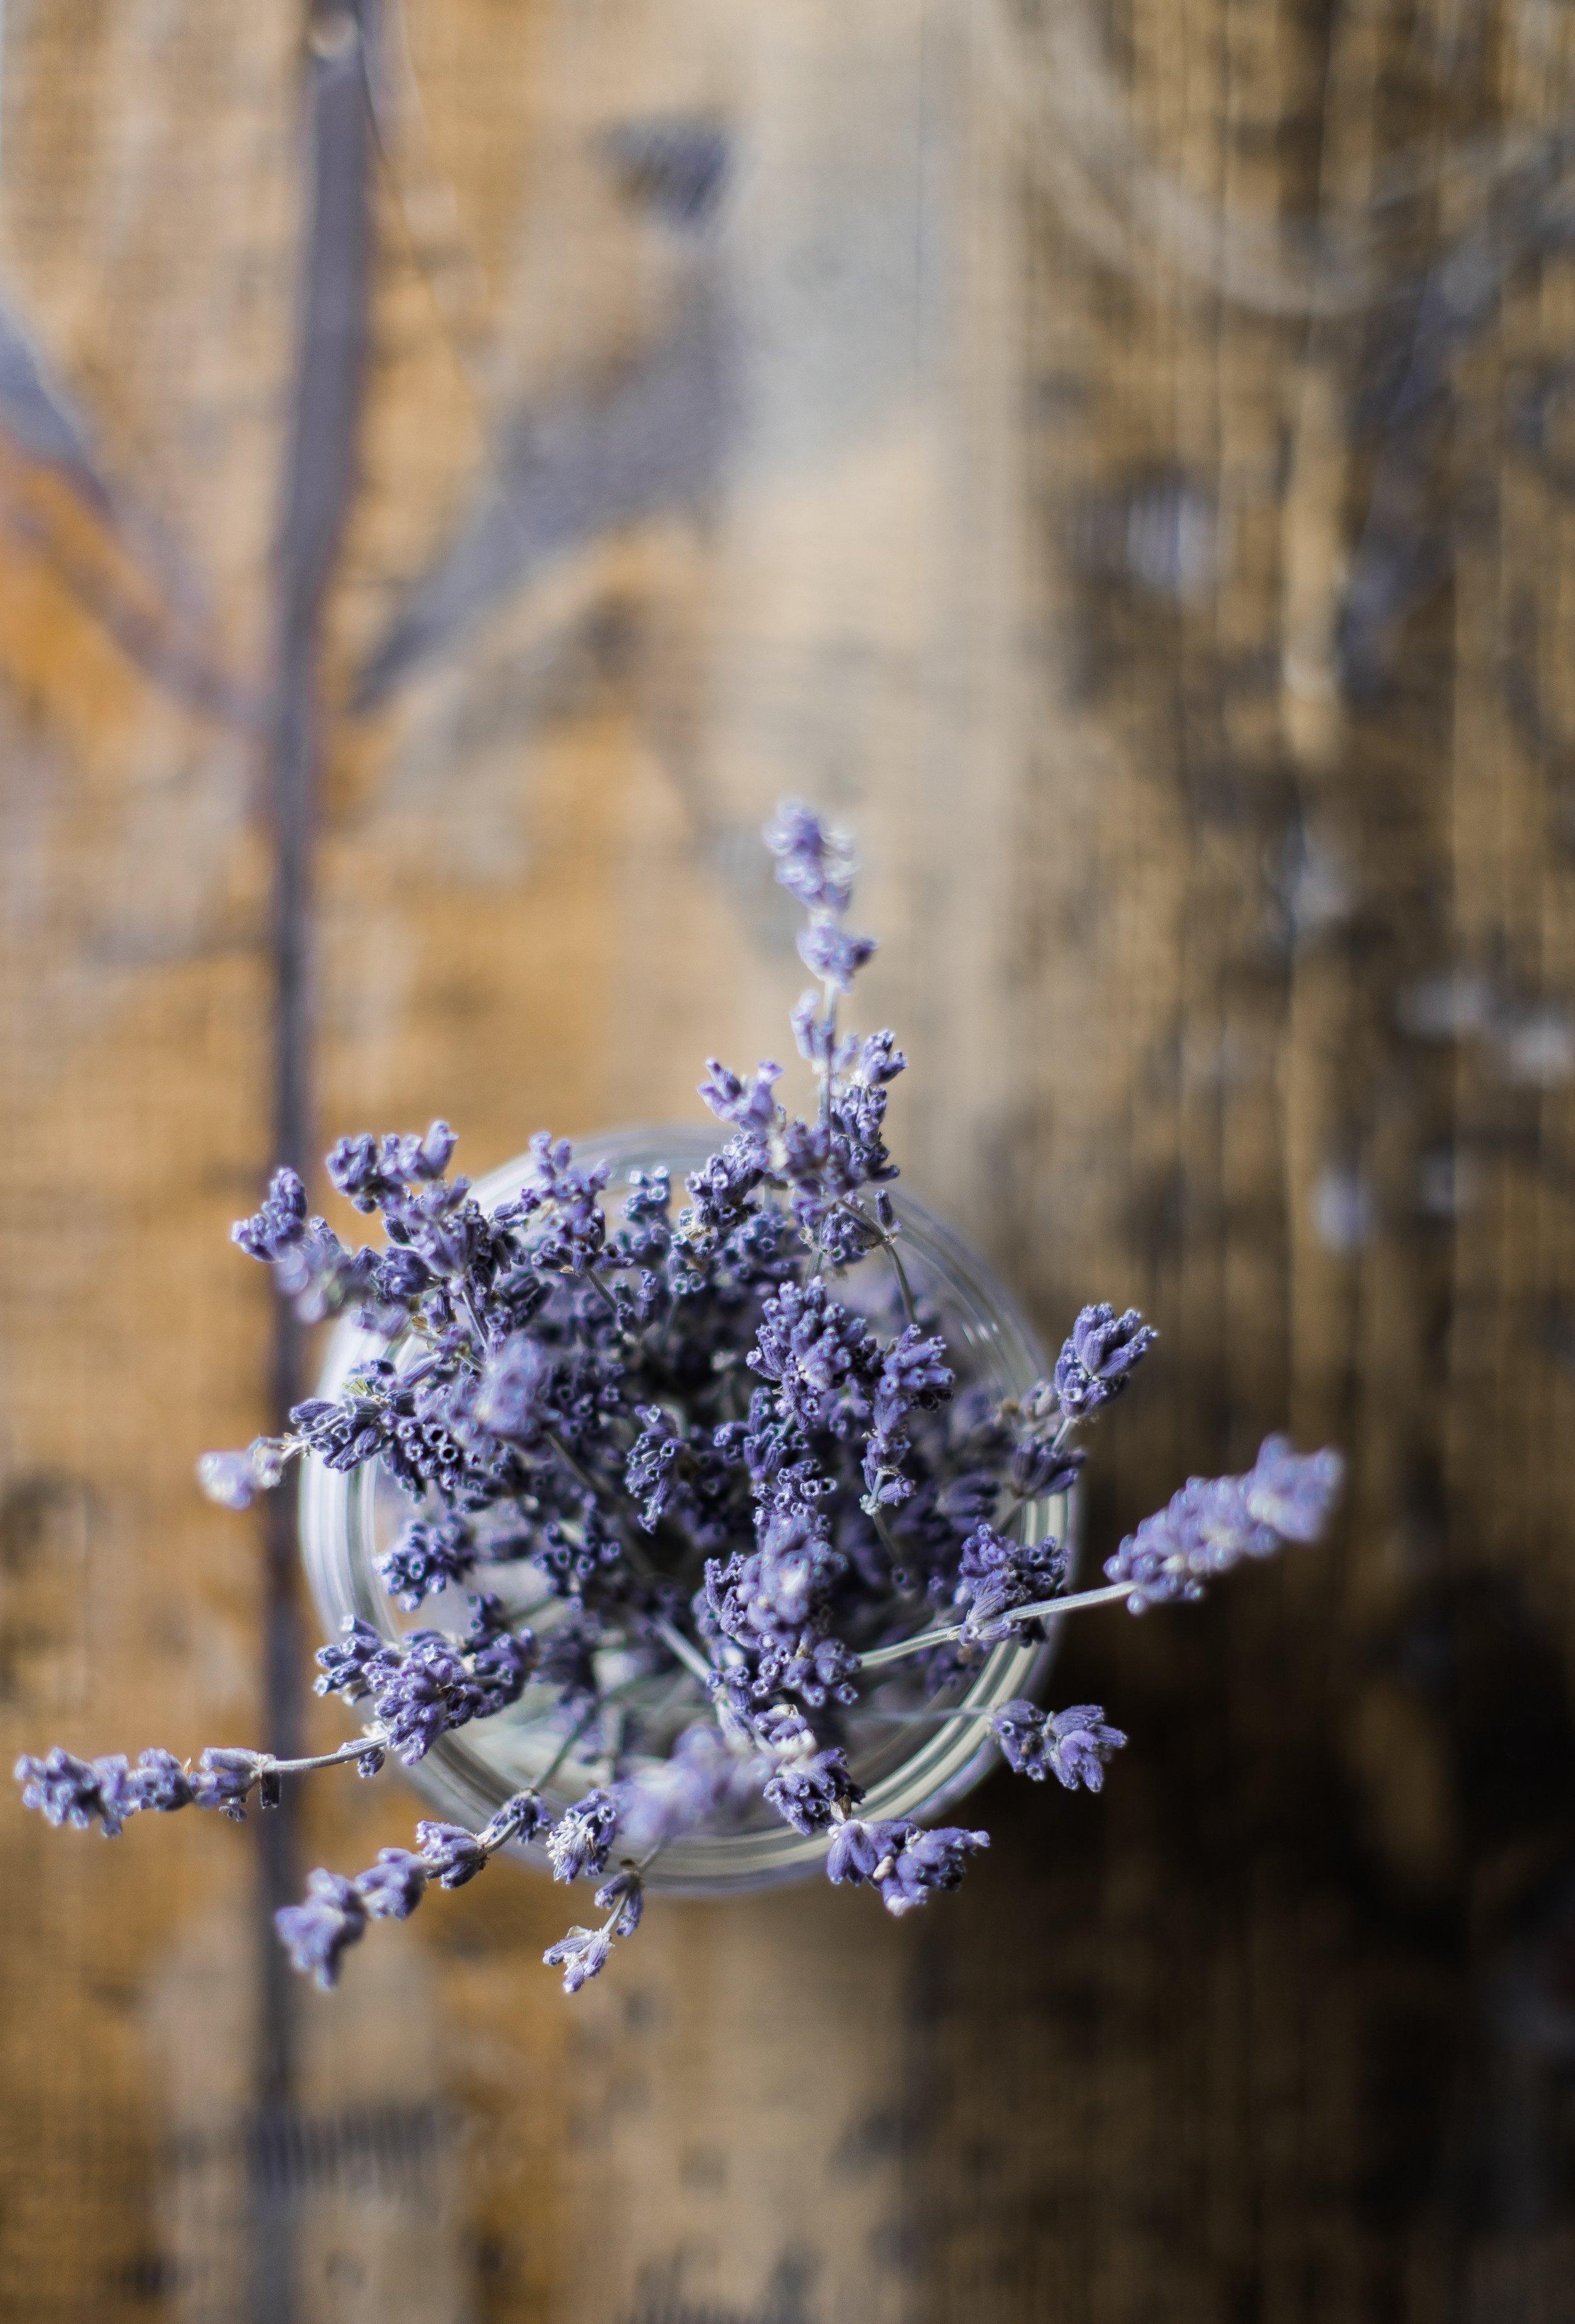 Bedroom Spray - 1 1/2 cups water1/2 cup distilled white vinegar12- 15 drops essential oil (lavender & vanilla)